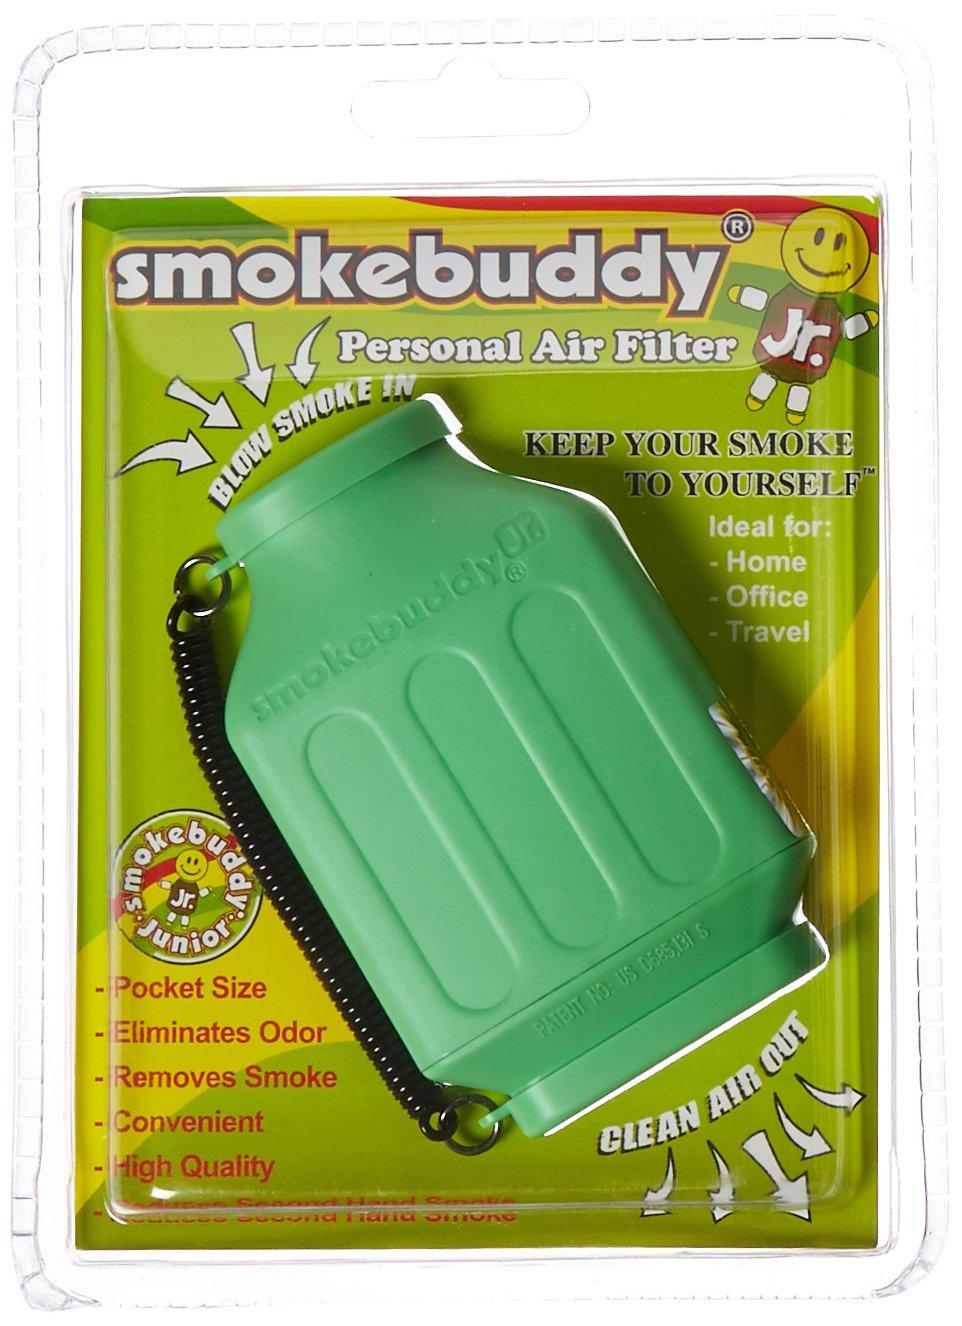 smokebuddy Green Jr Personal Air Filter